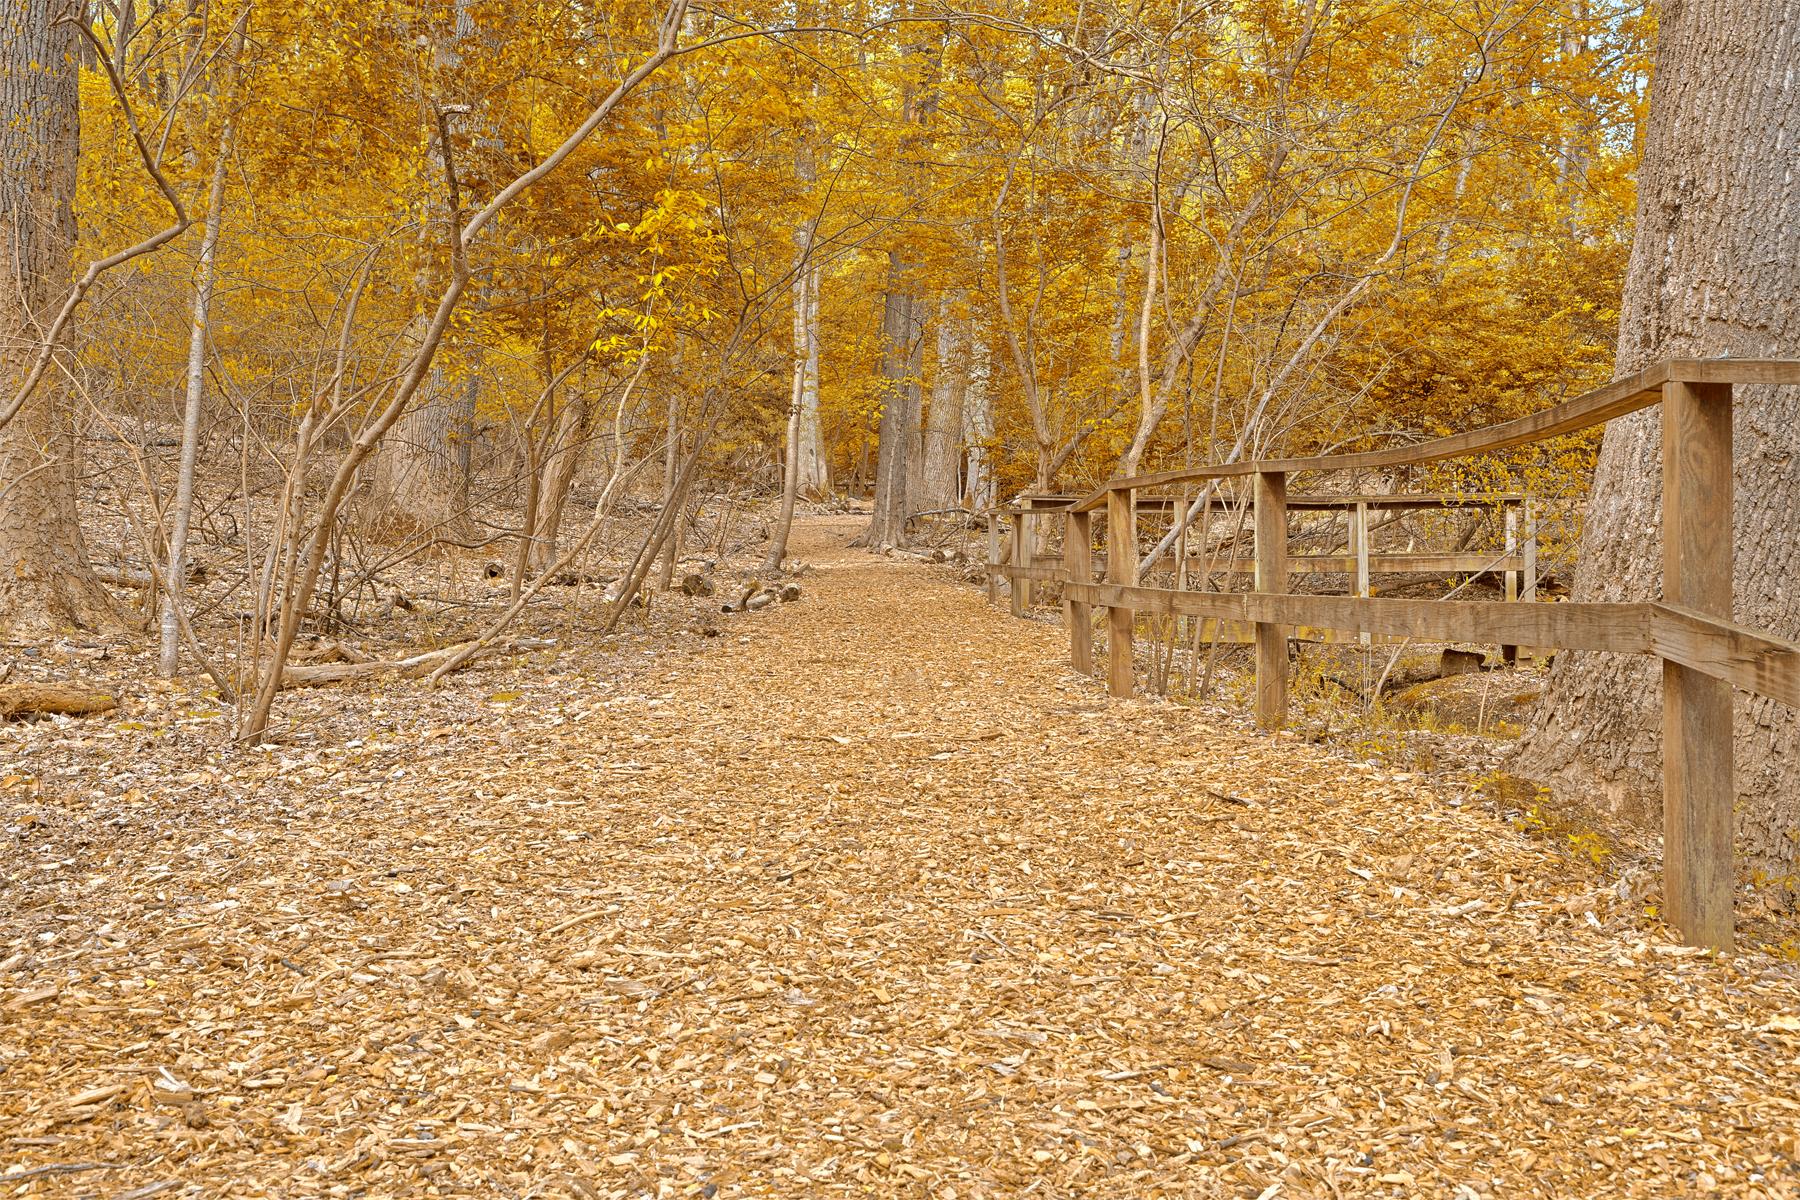 Gold sanctuary trail - hdr photo